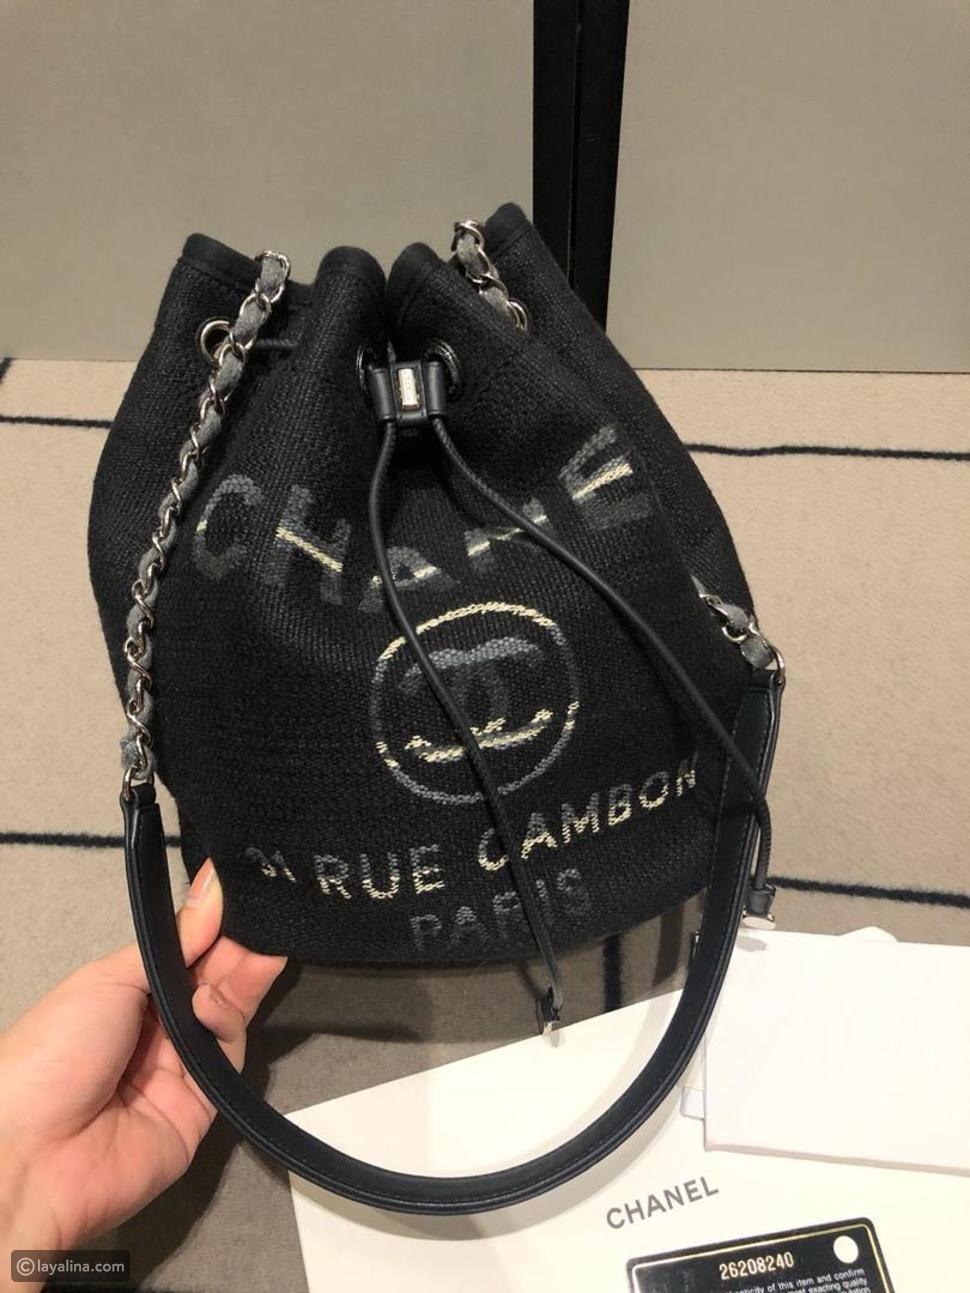 حقيبة شانييل 31 Rue Cambon Chanel Backpack